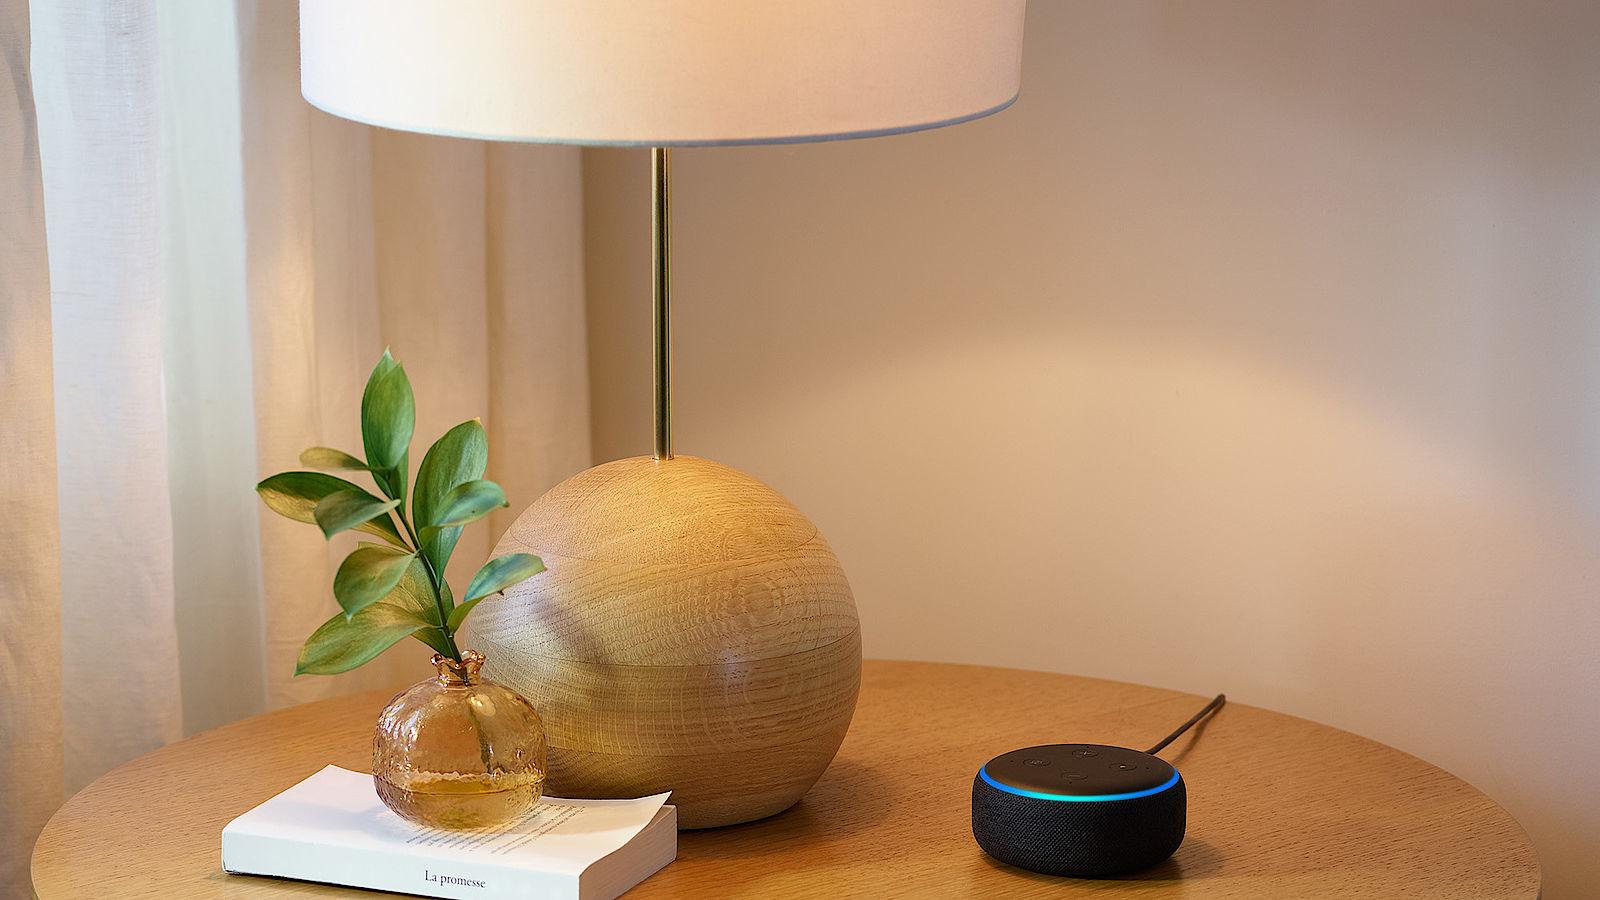 Dot Light Lampen : Apple music ist demnächst auf amazon echo verfügbar